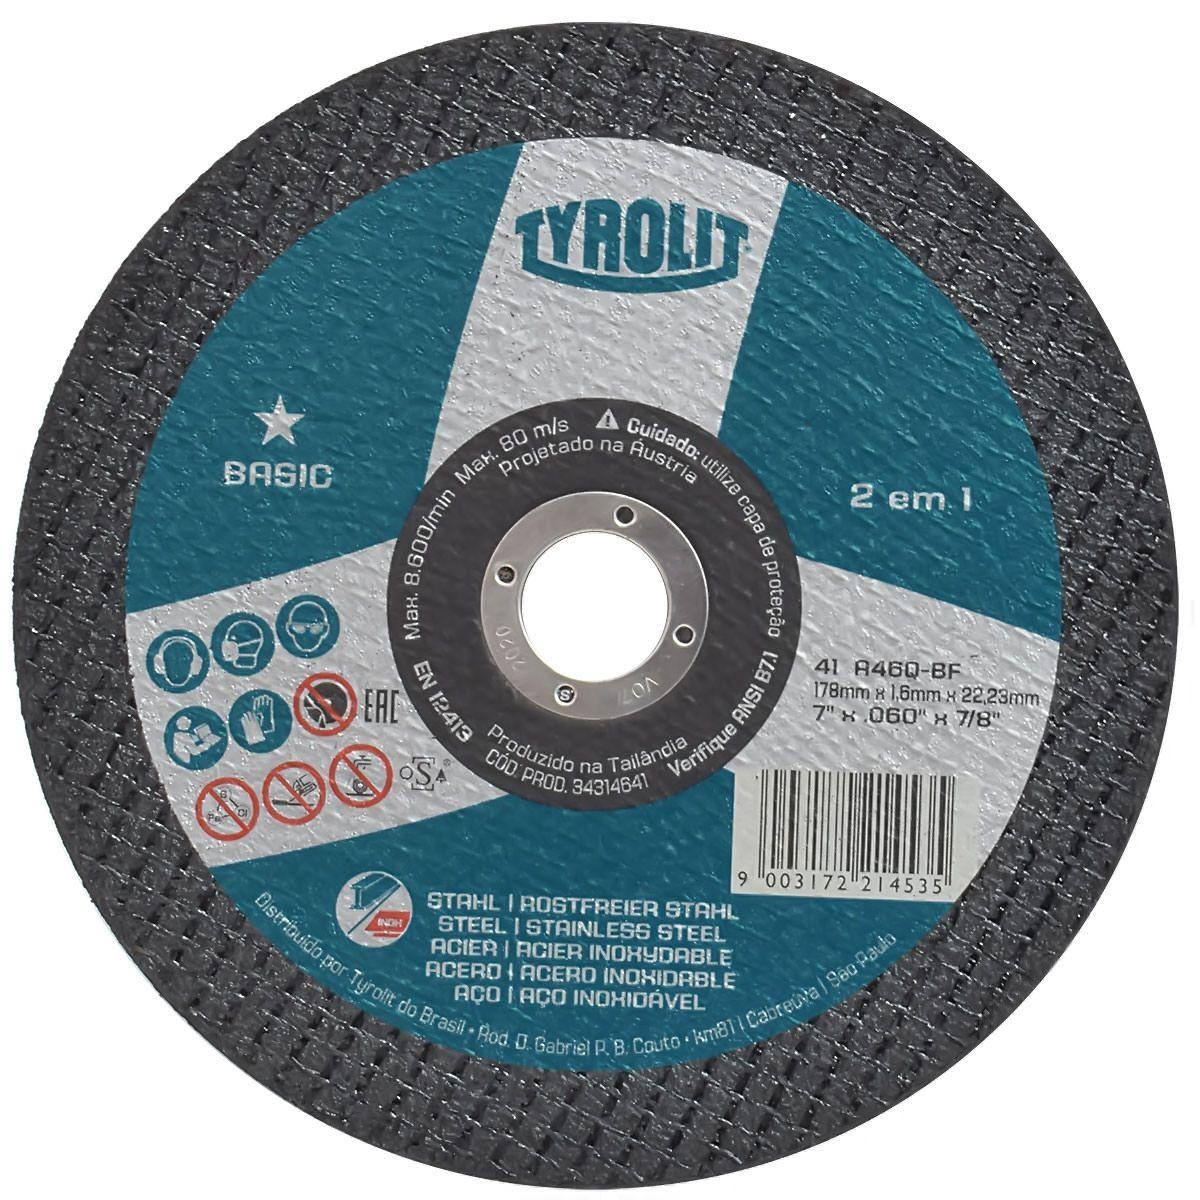 Disco de Corte Basic 180x1,6mm TYROLIT 34314641